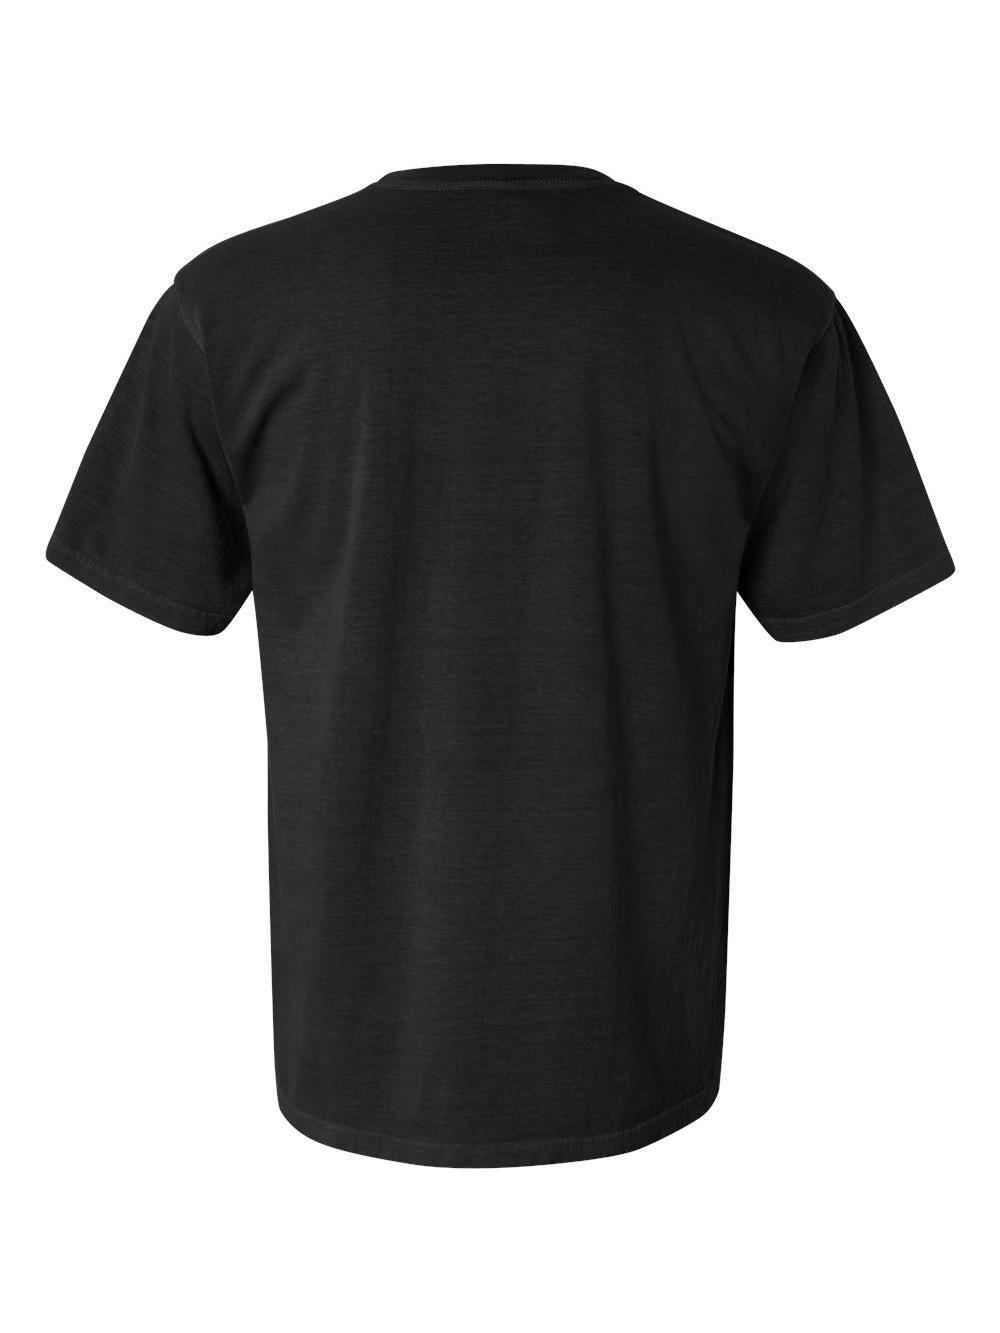 Comfort-Colors-Garment-Dyed-Heavyweight-Ringspun-Short-Sleeve-Shirt-1717 thumbnail 10